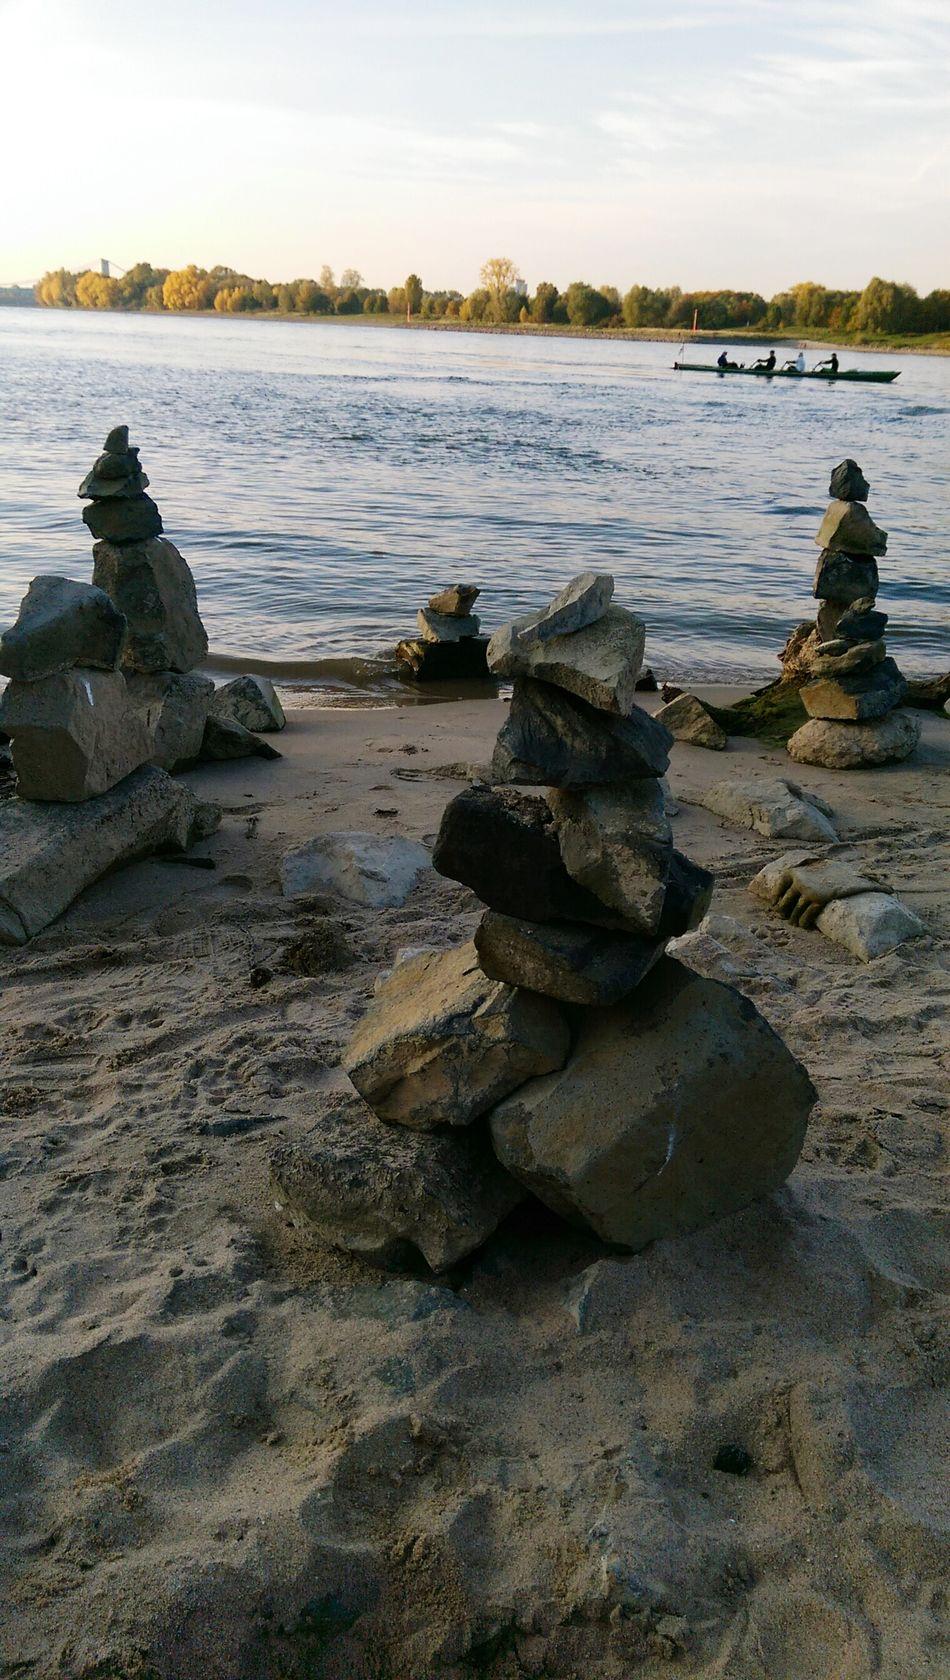 Beautiful Stones 😊 Rheinufer Cologne Sand Beach Water River Boat Sunshine Gooutandplay Creativity